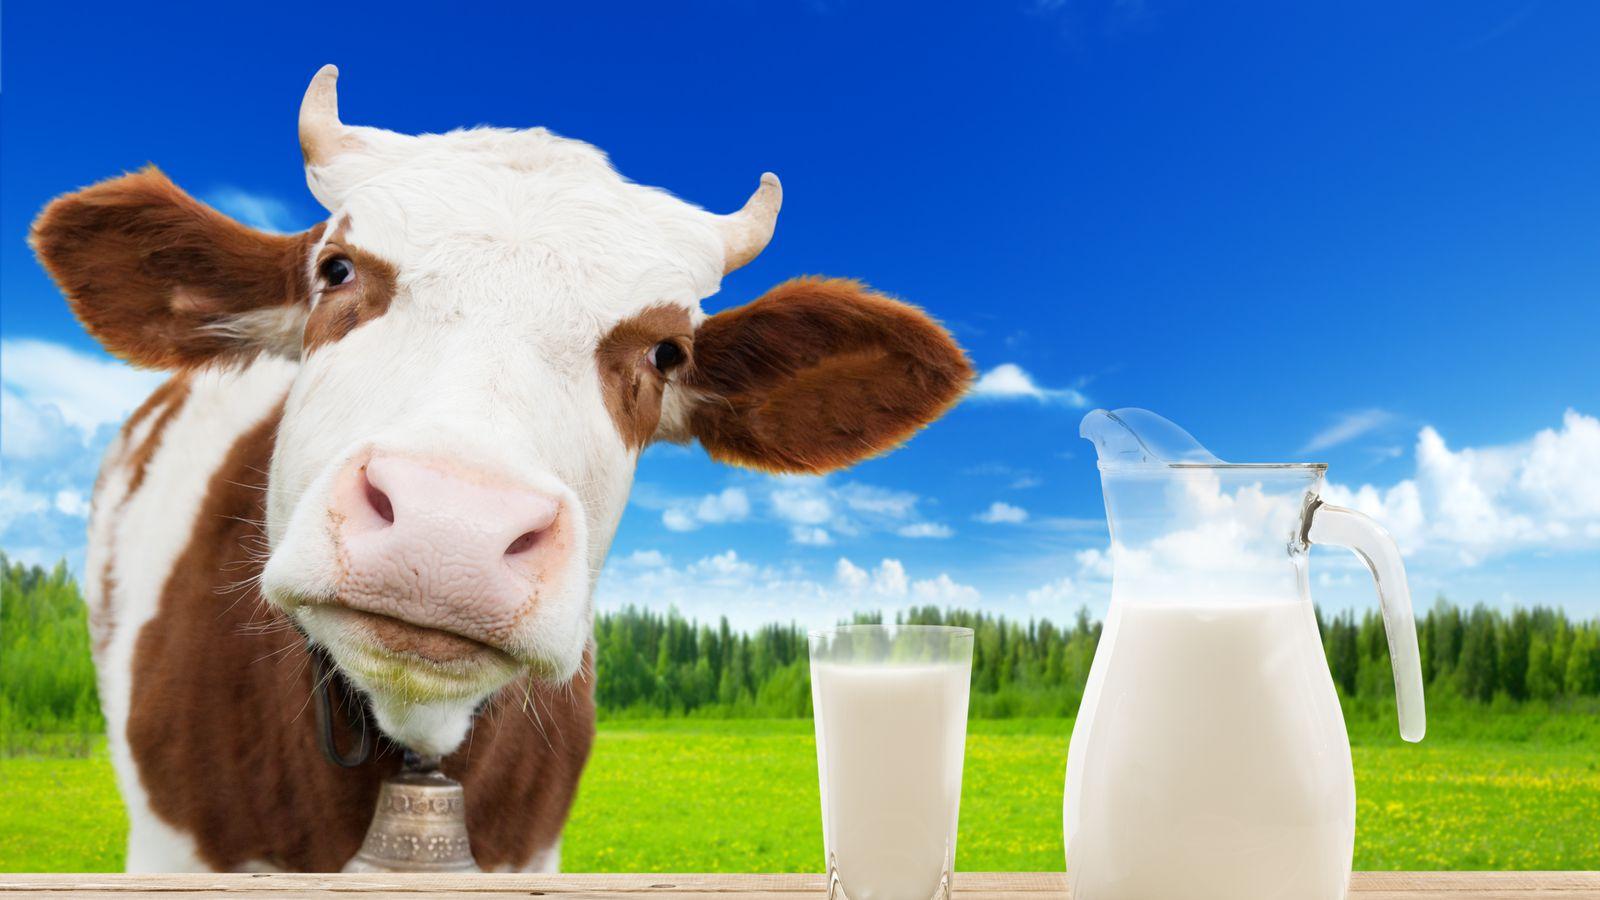 Google Makes Desktop Search Look More Mobile-ish to Milk More ...